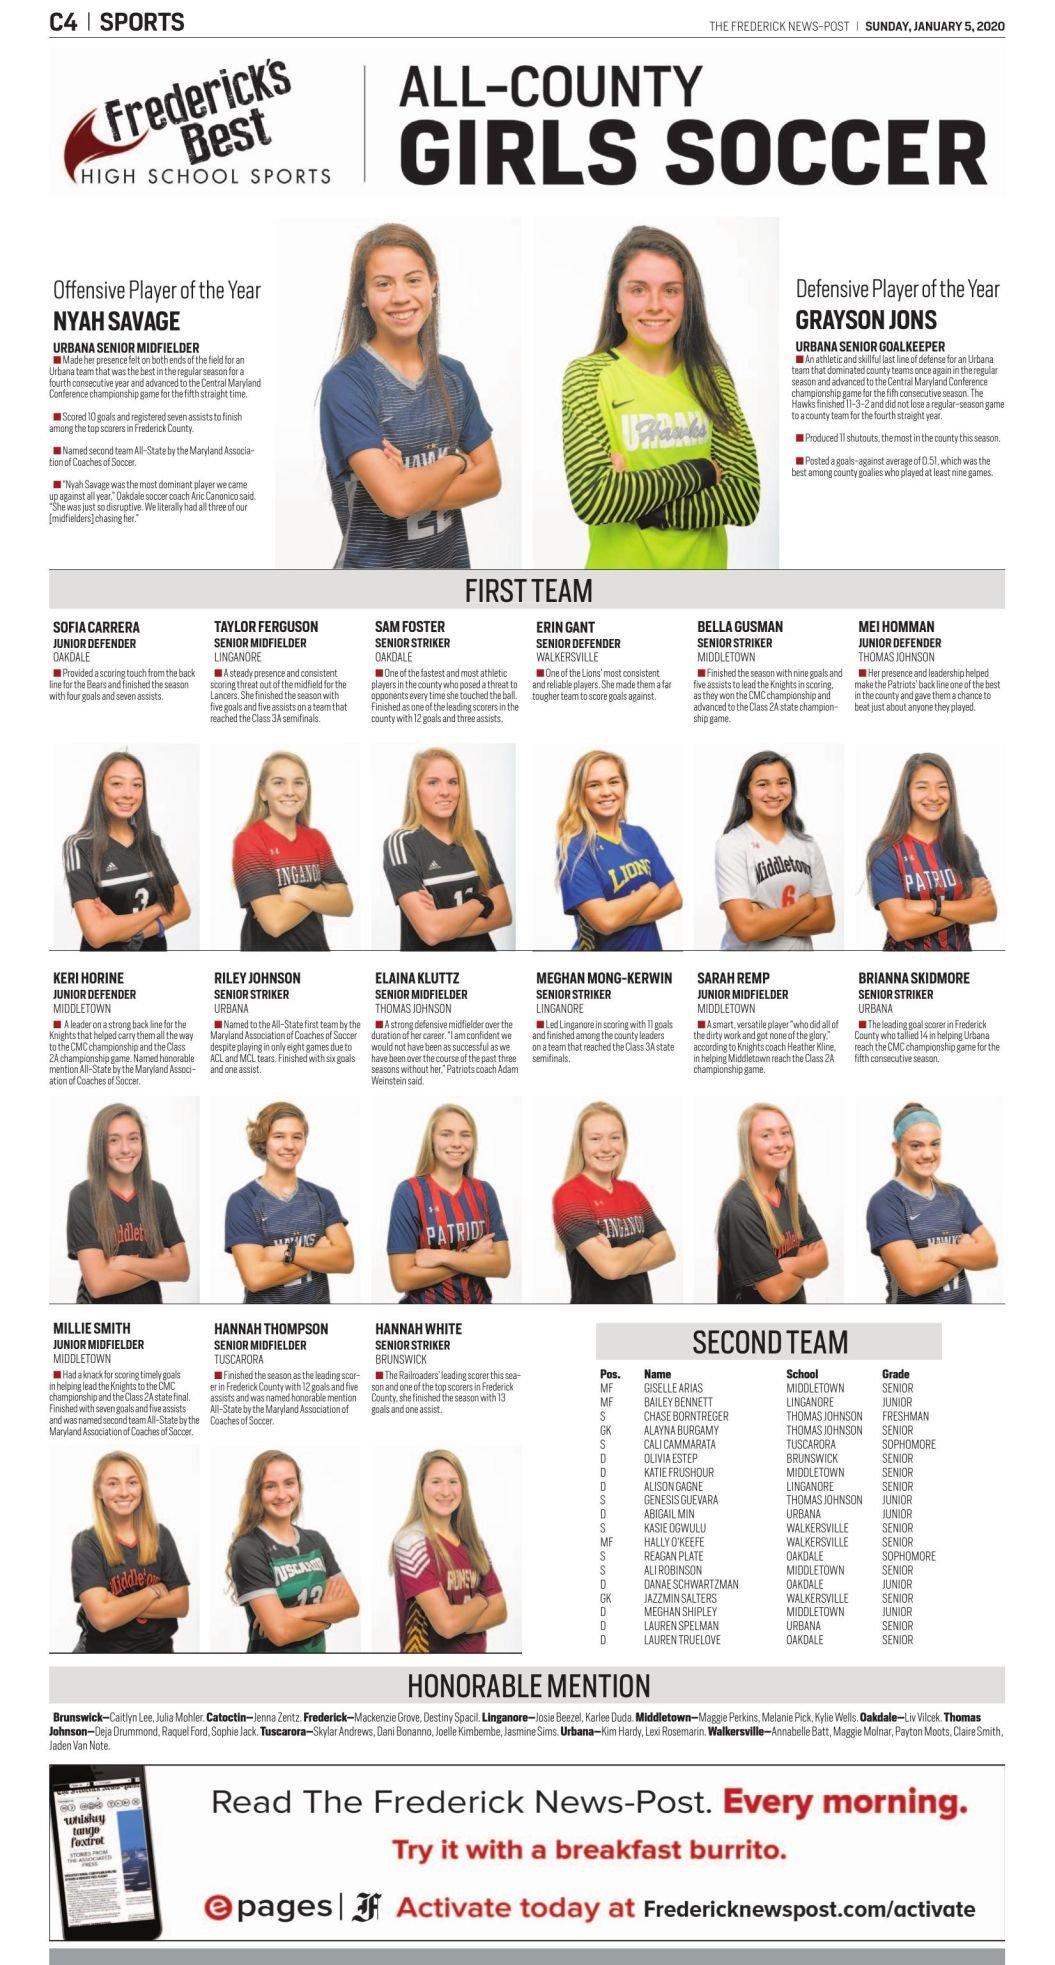 2019 All-County Girls Soccer